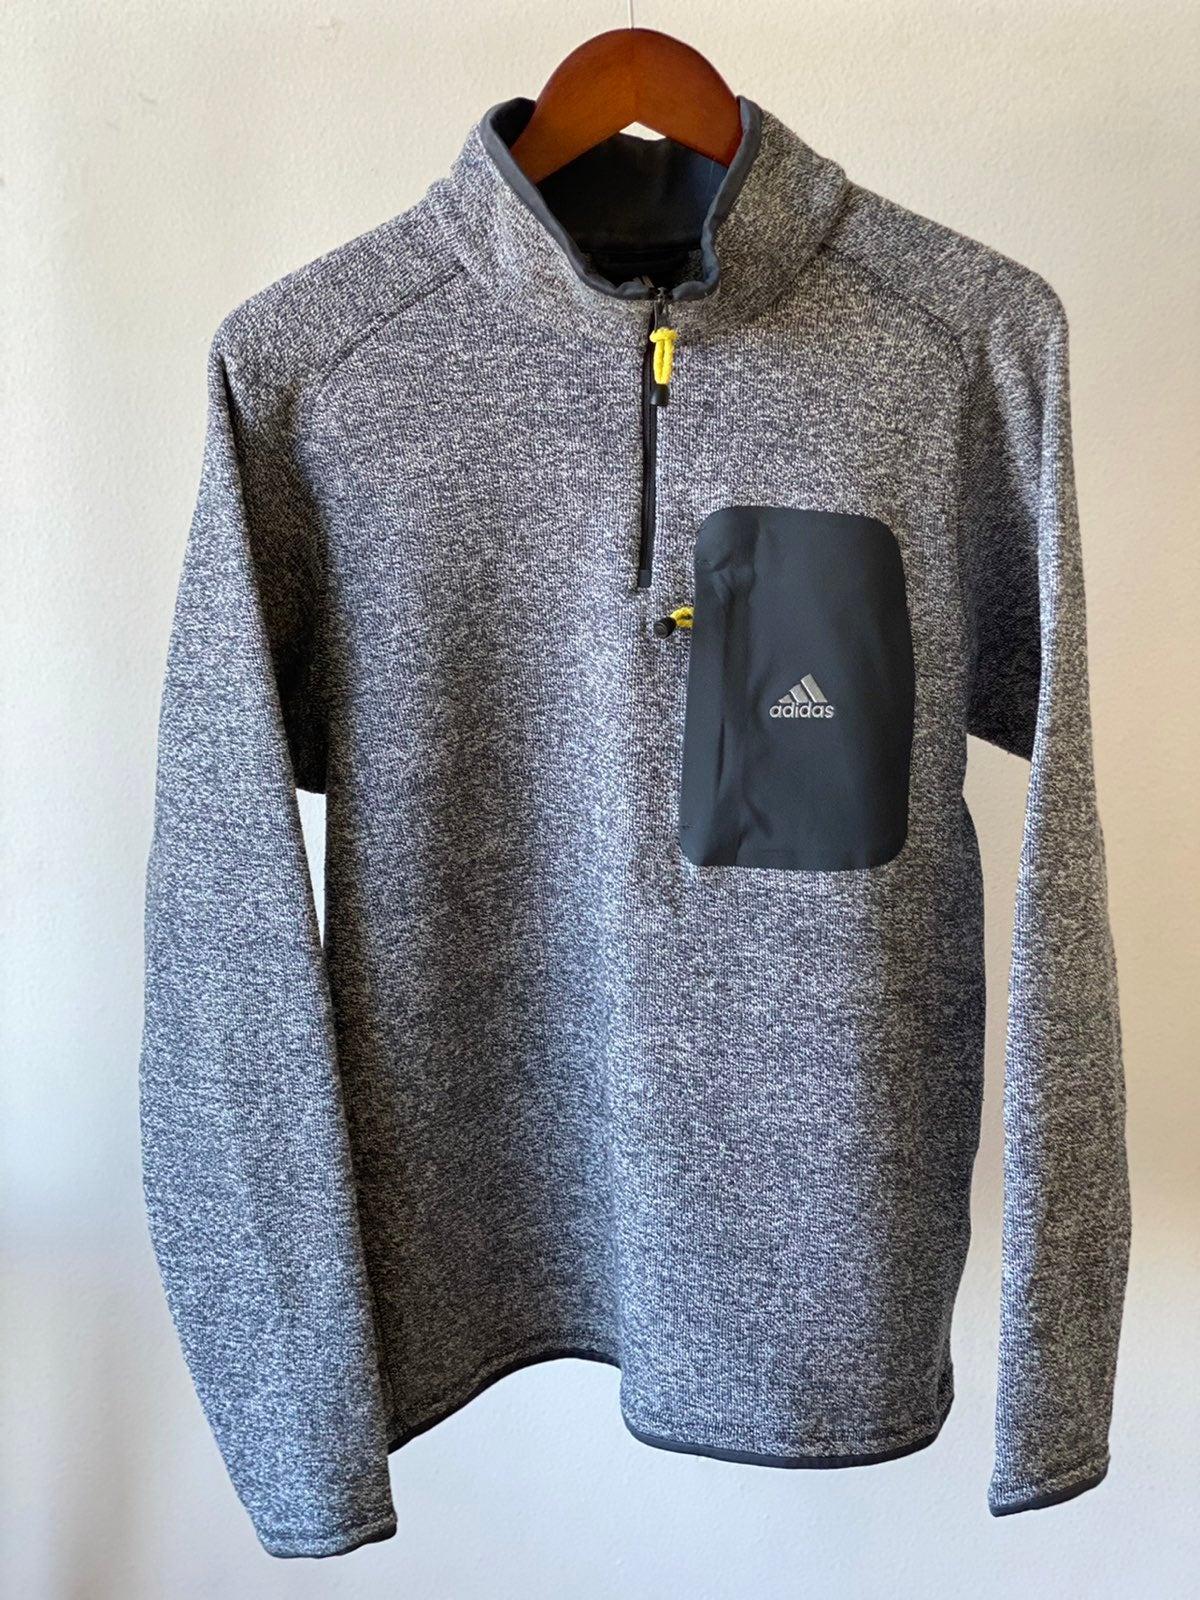 Adidas 3-Stripe Knit Half-Zip Sweater